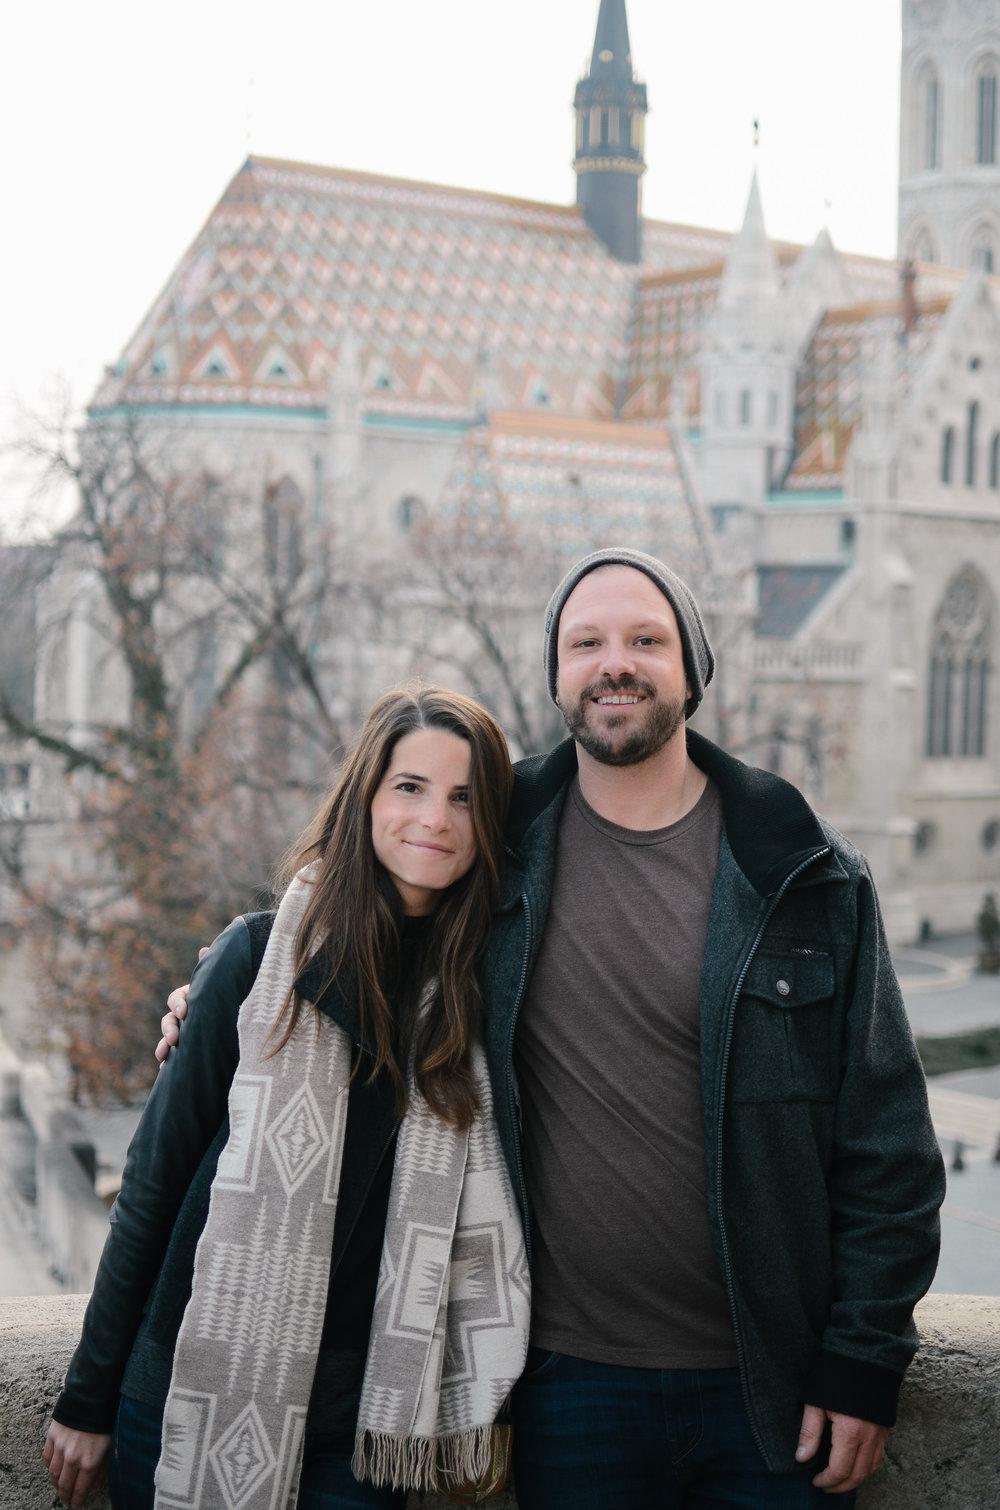 budapest-hungary-travel-guide-lifeonpine_DSC_0647.jpg